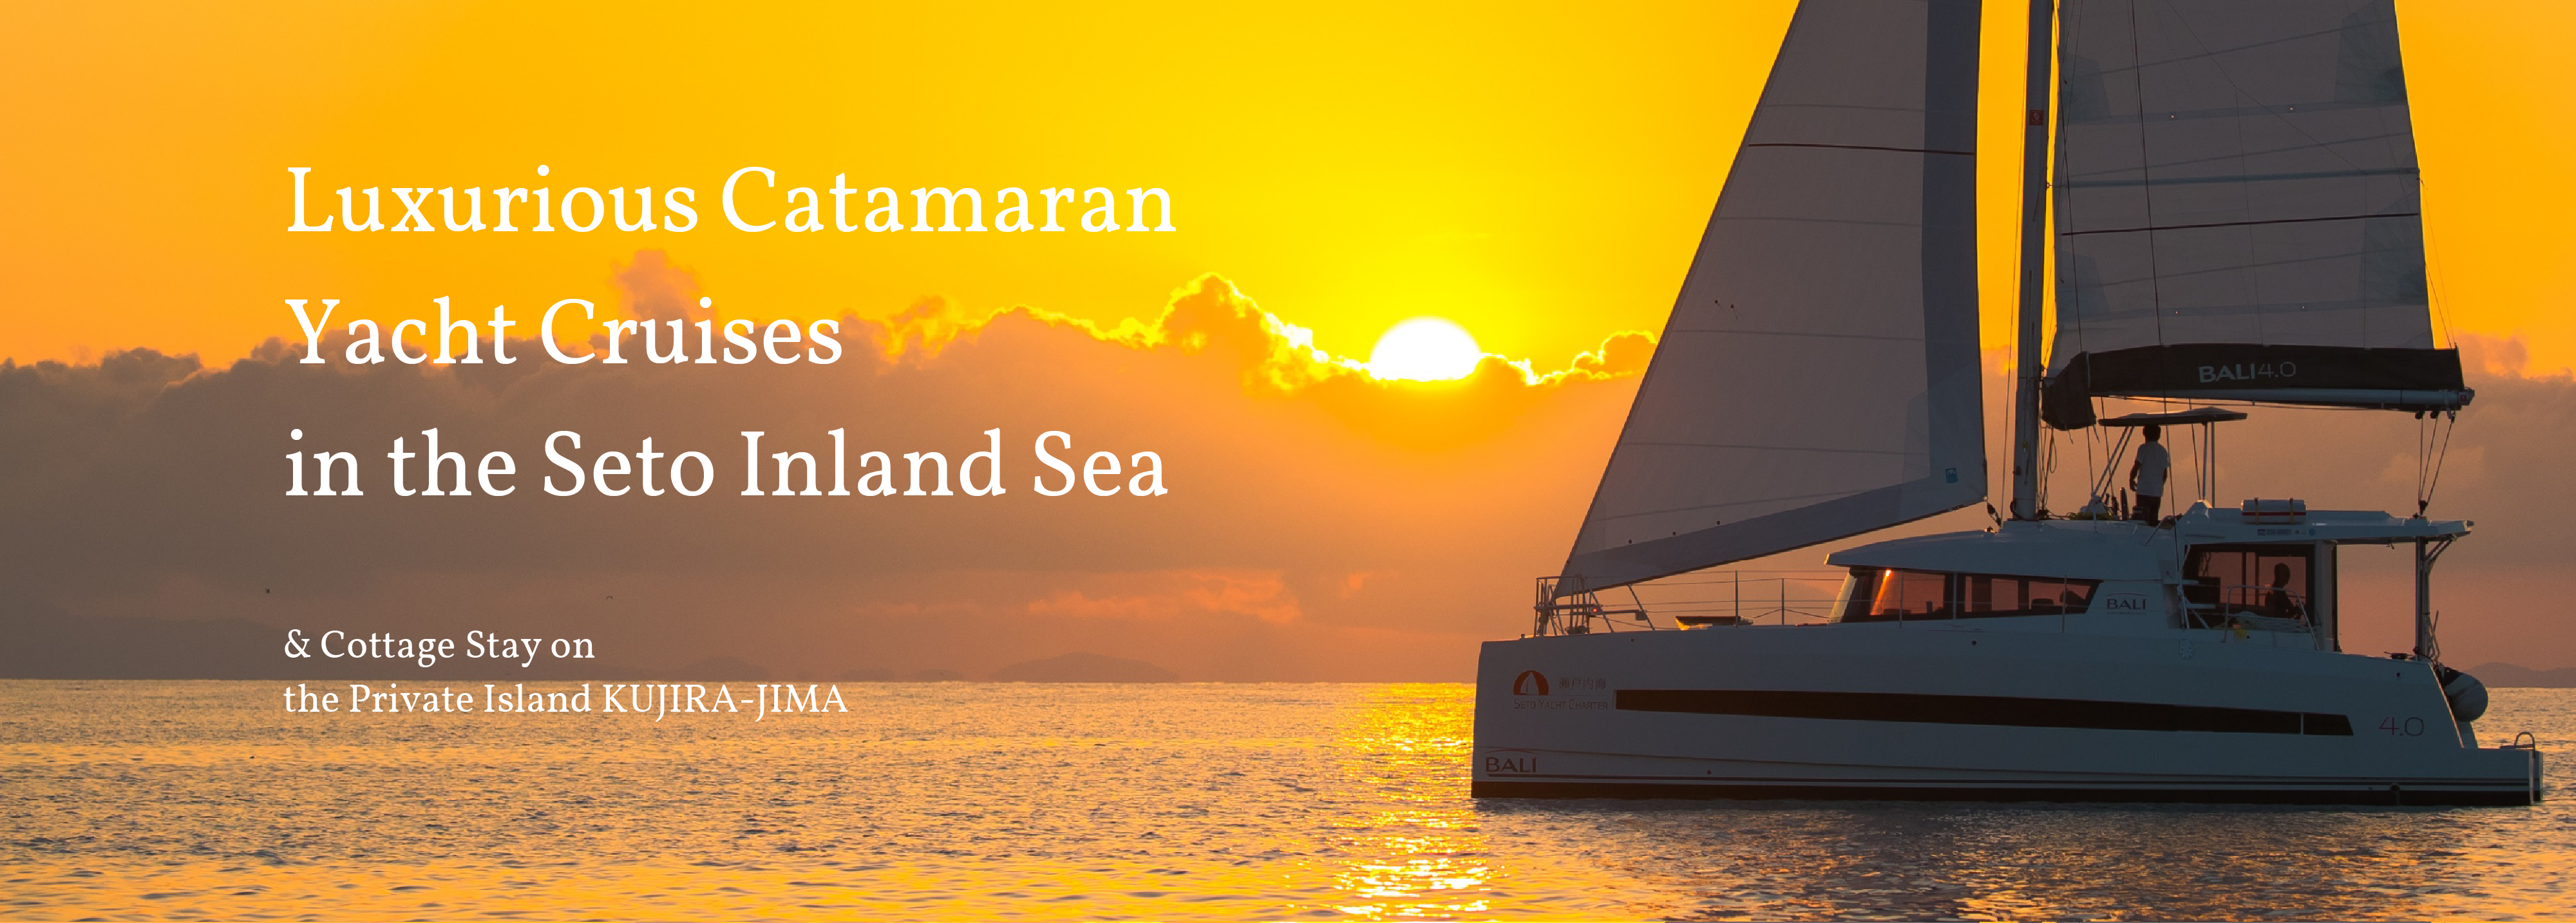 Luxurious Catamaran Yacht Cruises in the Seto Inland Sea